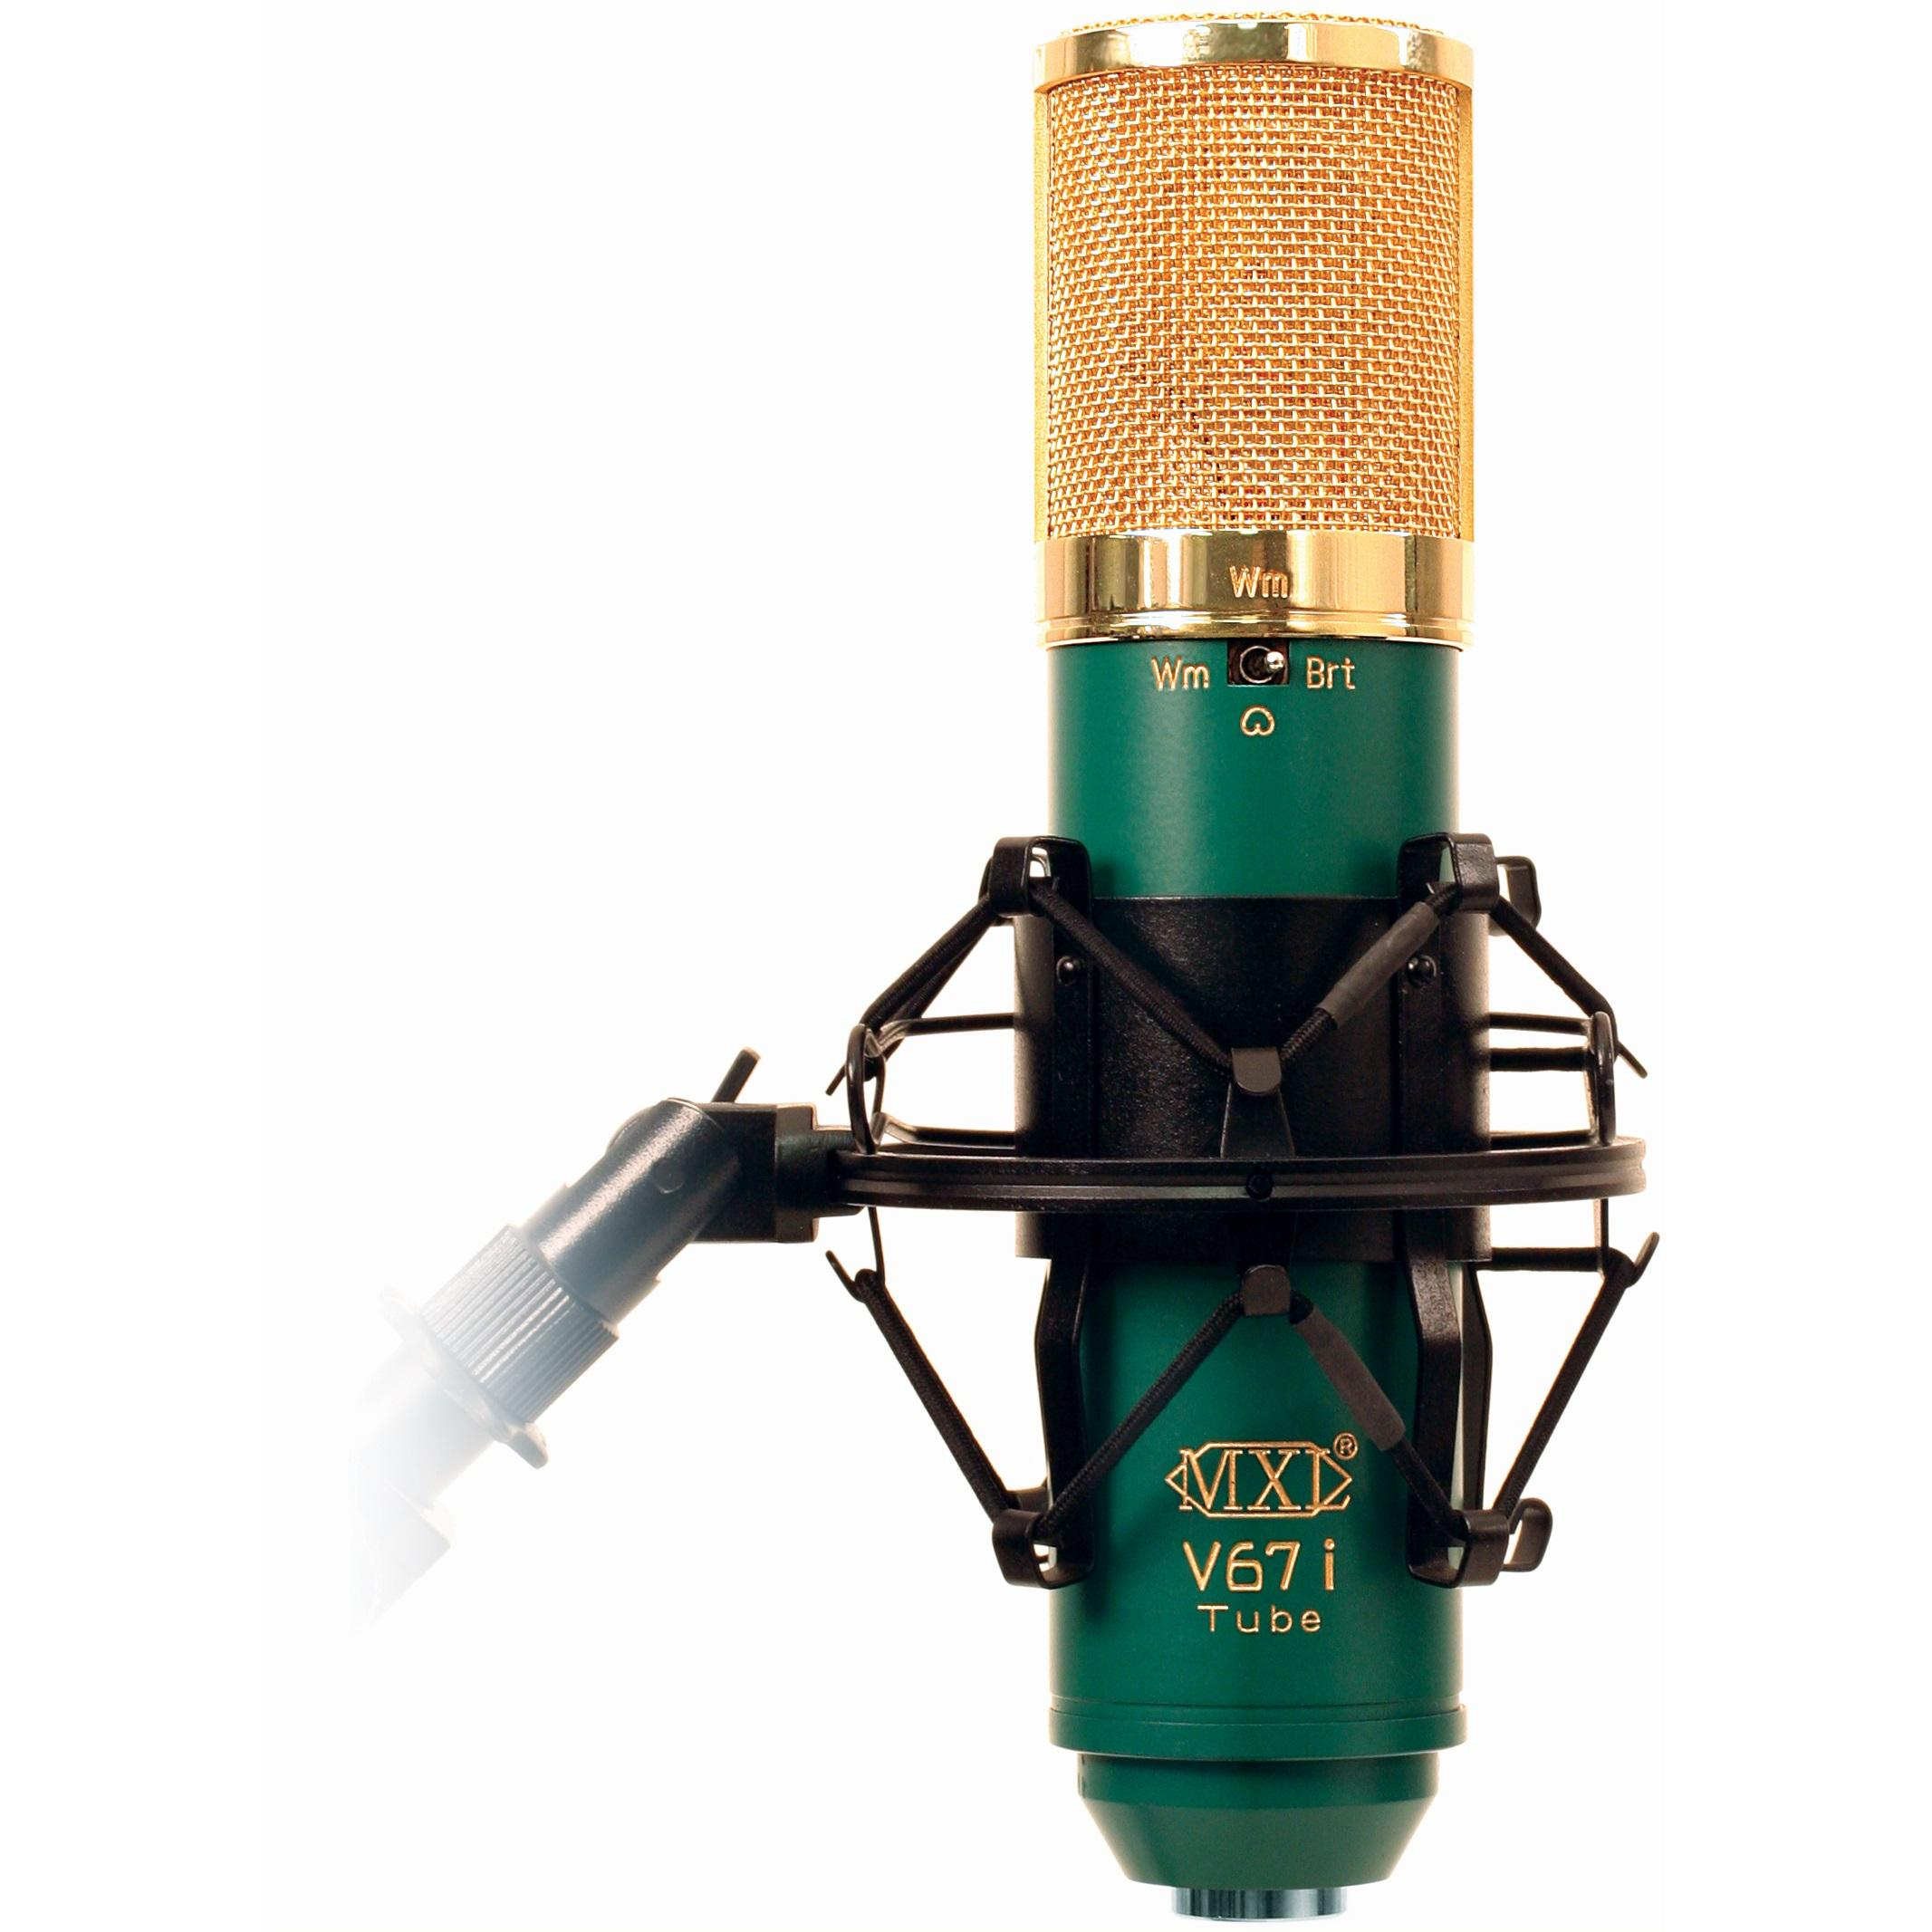 Amazon.com: MXL V67i Tube Dual Diaphragm Tube Condenser Microphone